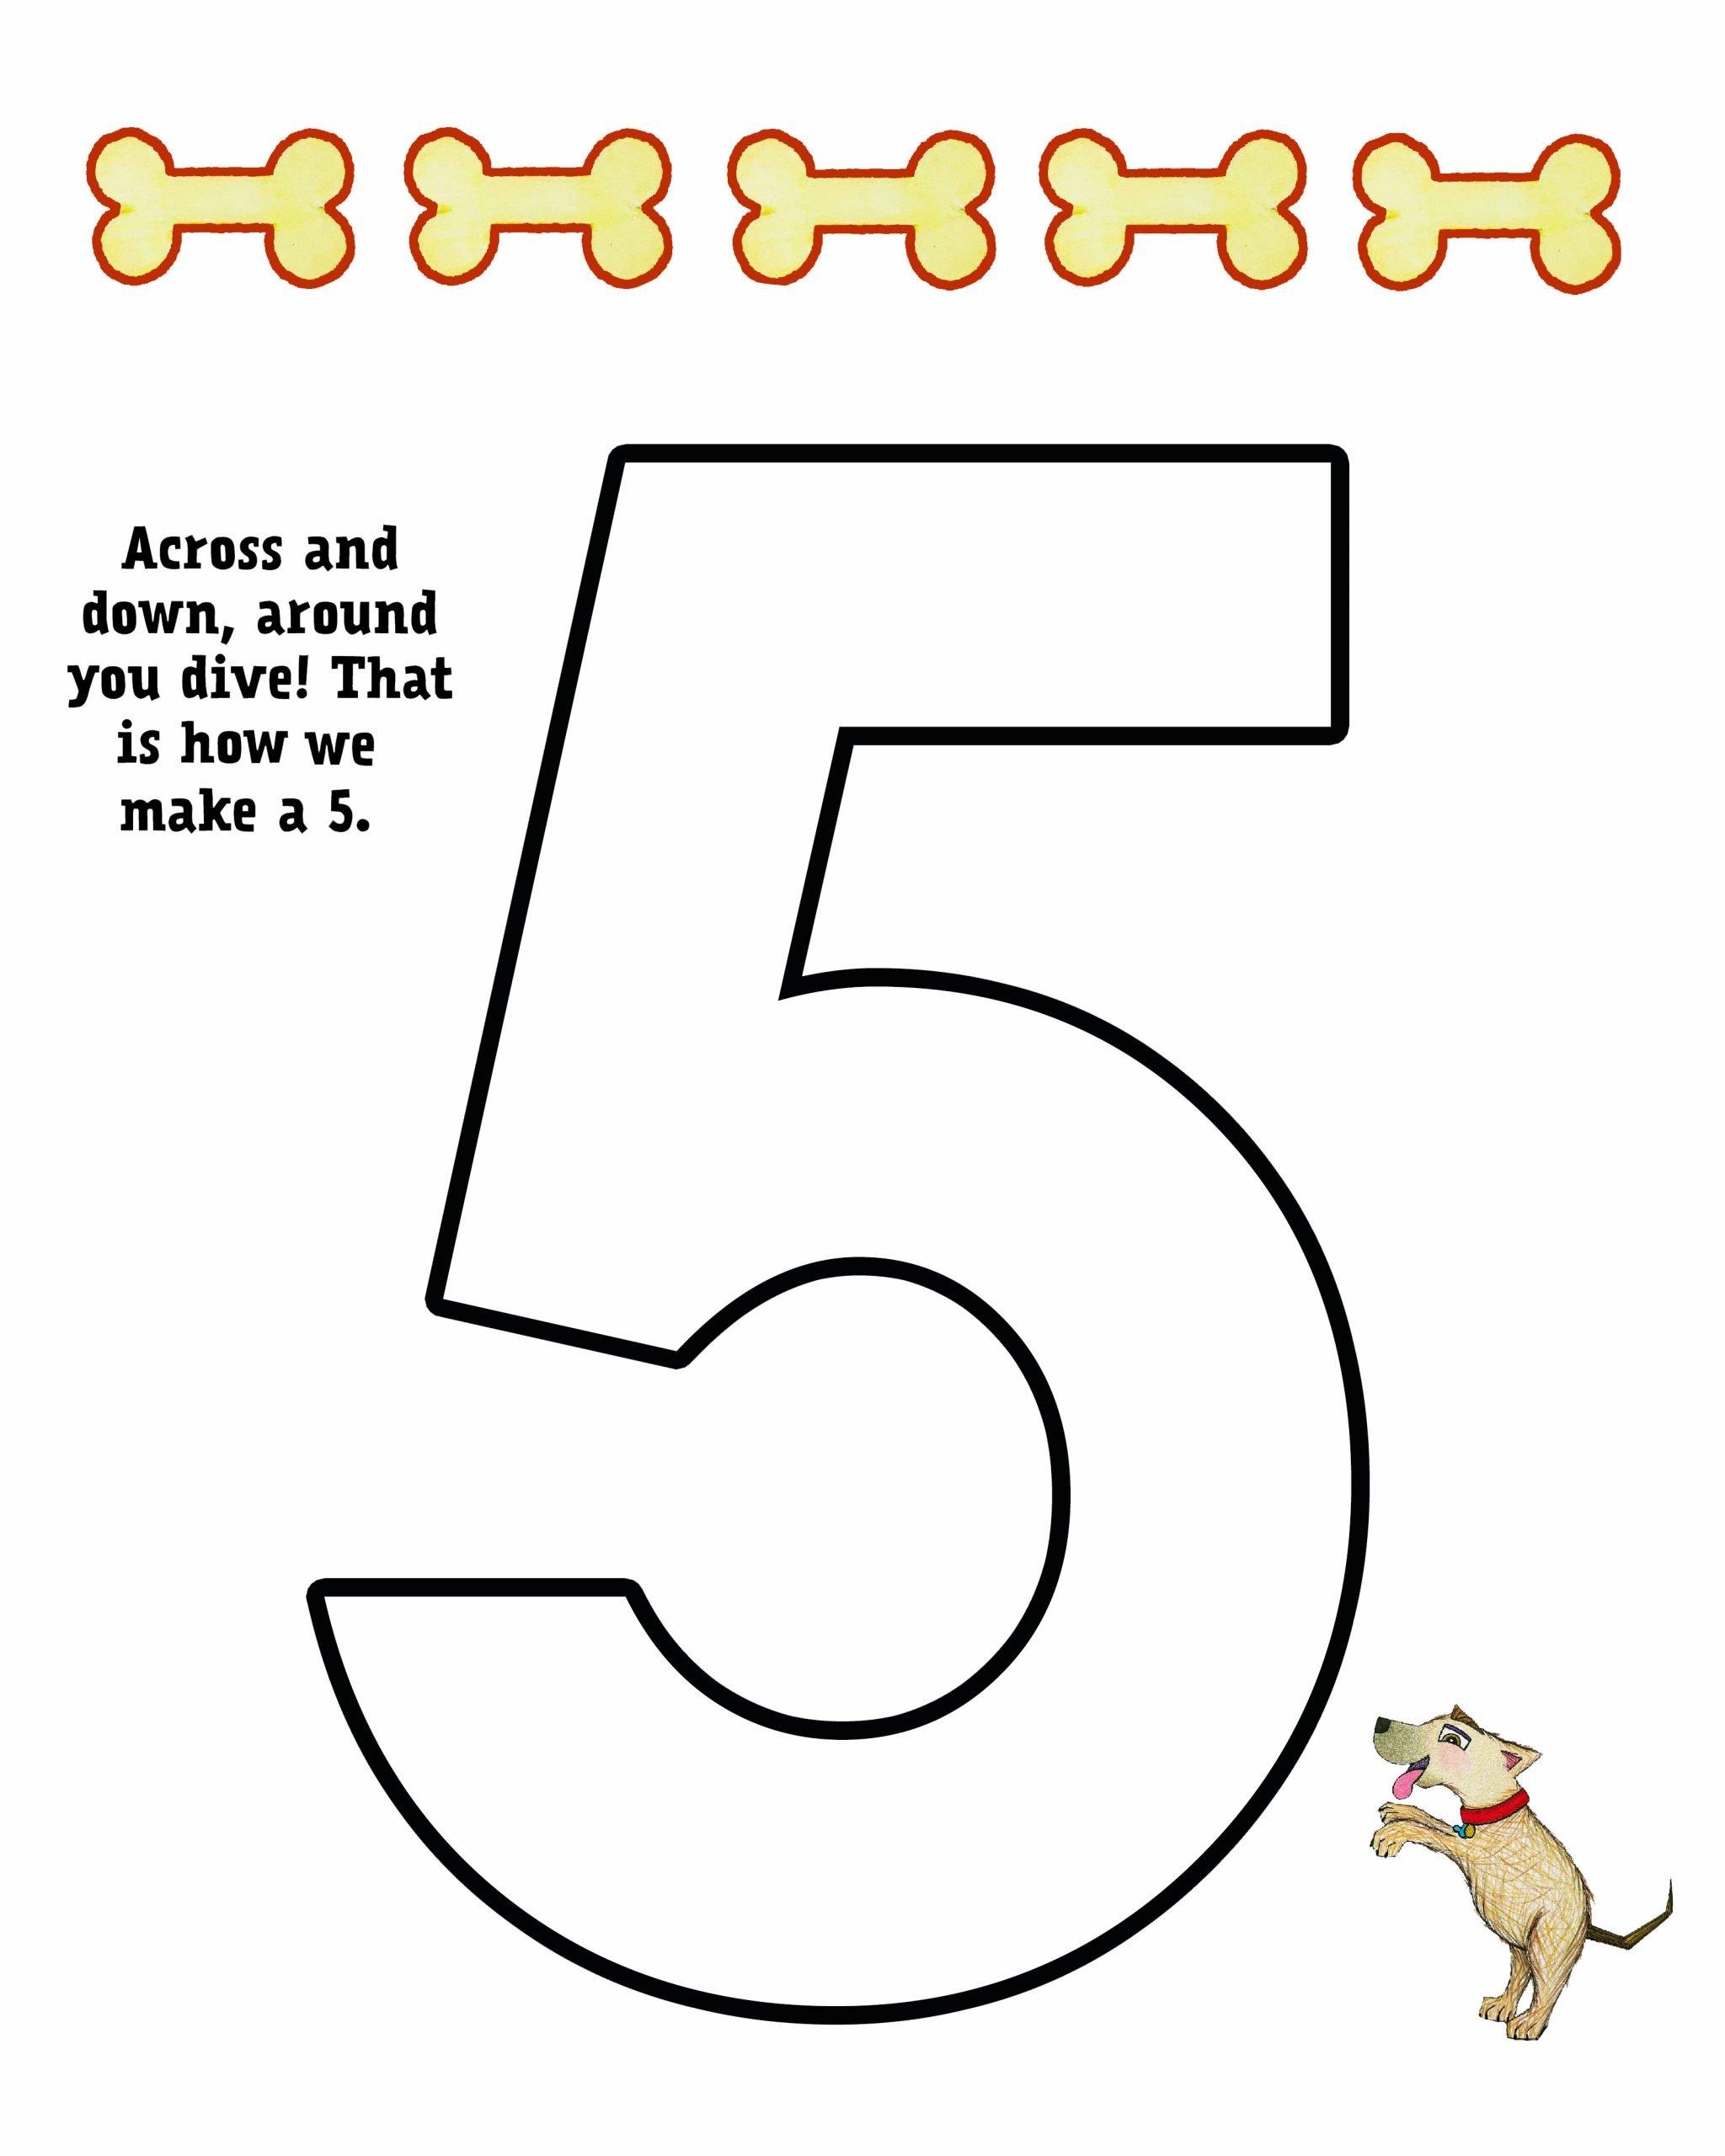 Free Animal Themed Printables for Preschool. #fhdhomeschoolers #freehomeschooldeals #animalthemedprintables #preschoolanimaltheme